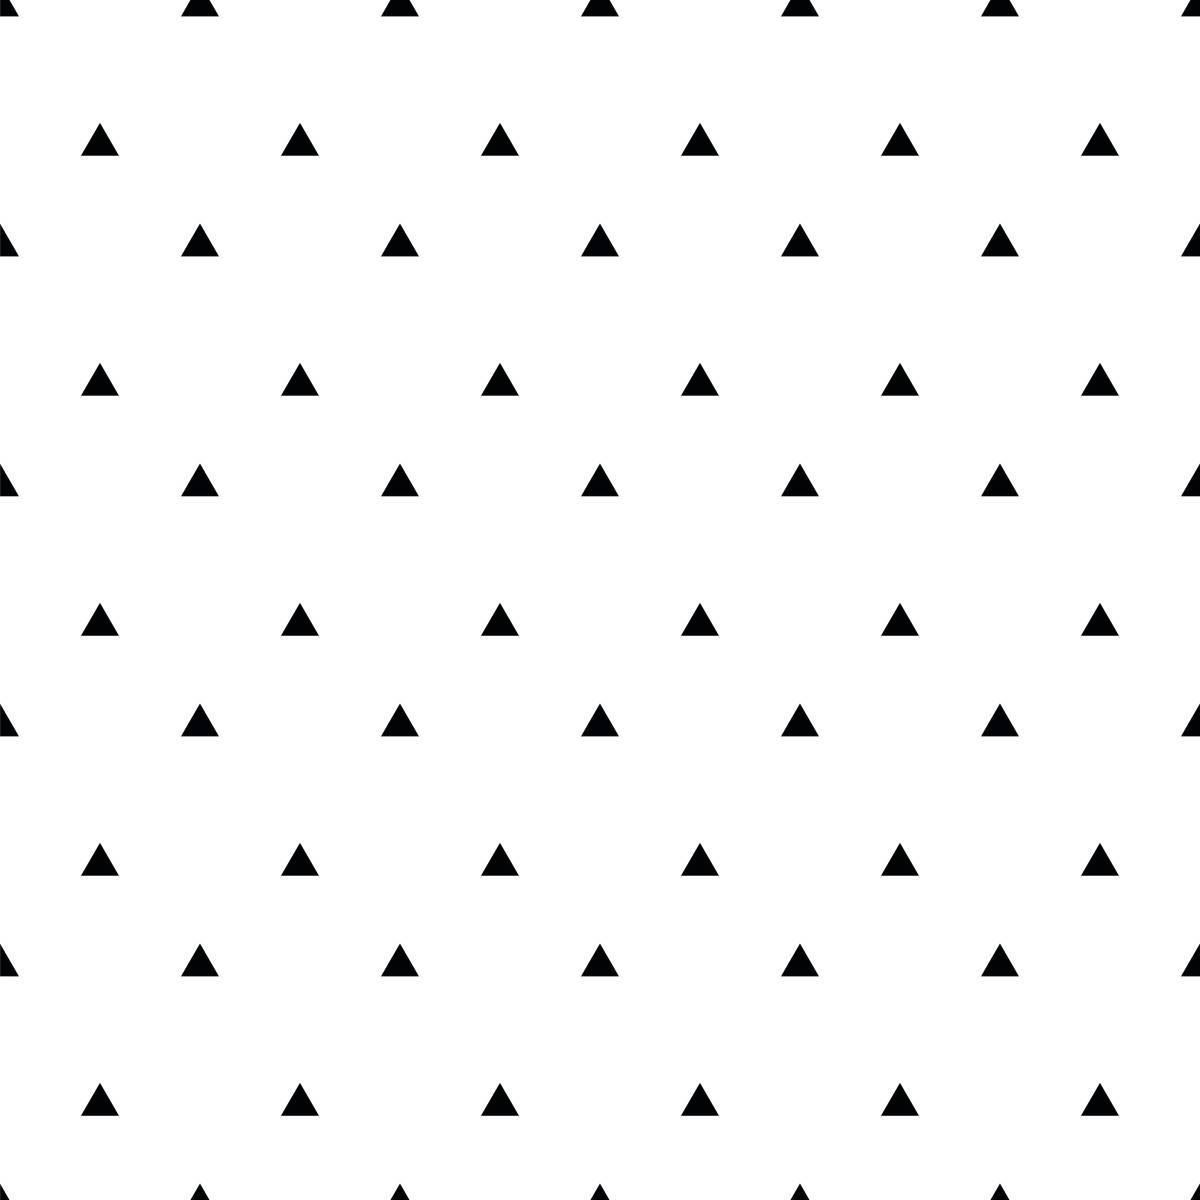 Papel de Parede Triângulo | Adesivo Vinilico imagem 2